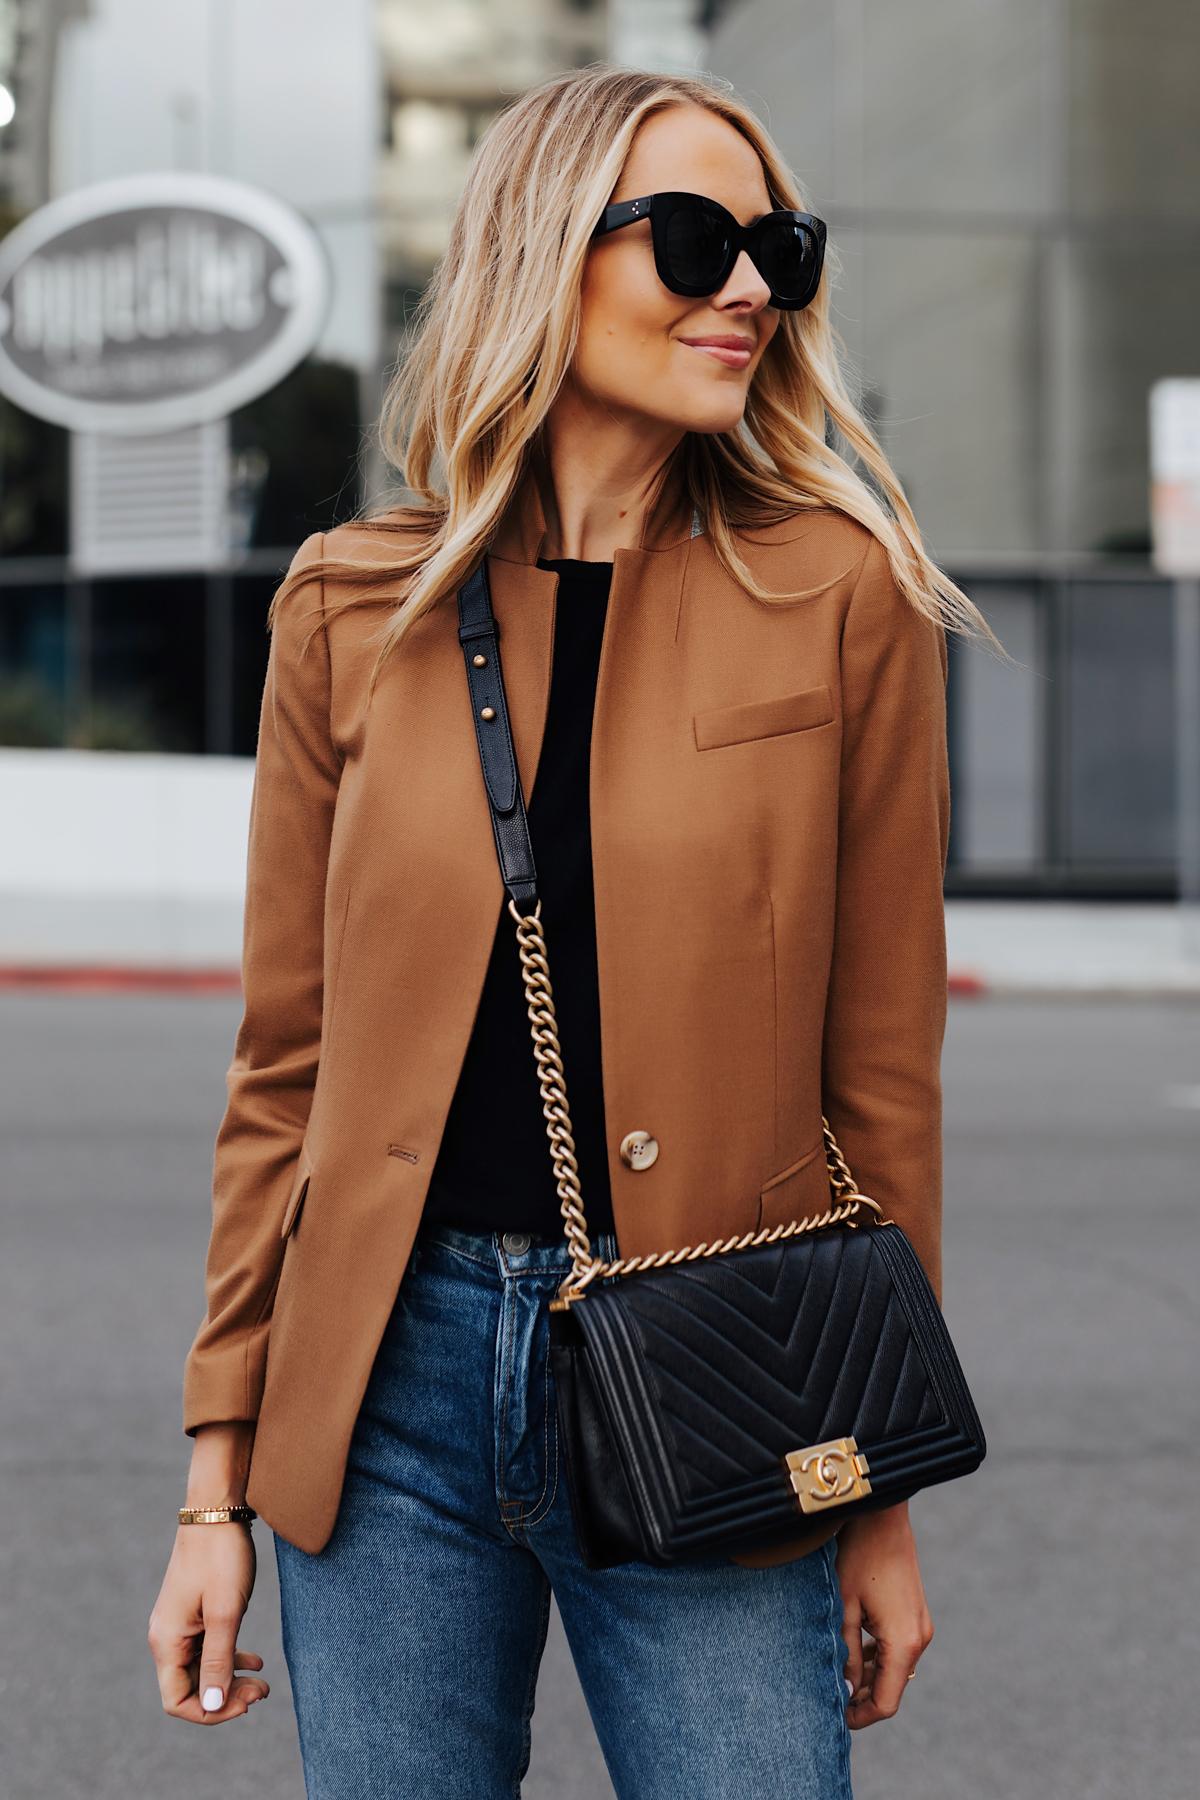 Blonde Woman Wearing Camel Blazer eBay Authenticate Chanel Black Boy Bag Denim Skinny Jeans Fashion Jackson San Diego Fashion Blogger Street Style